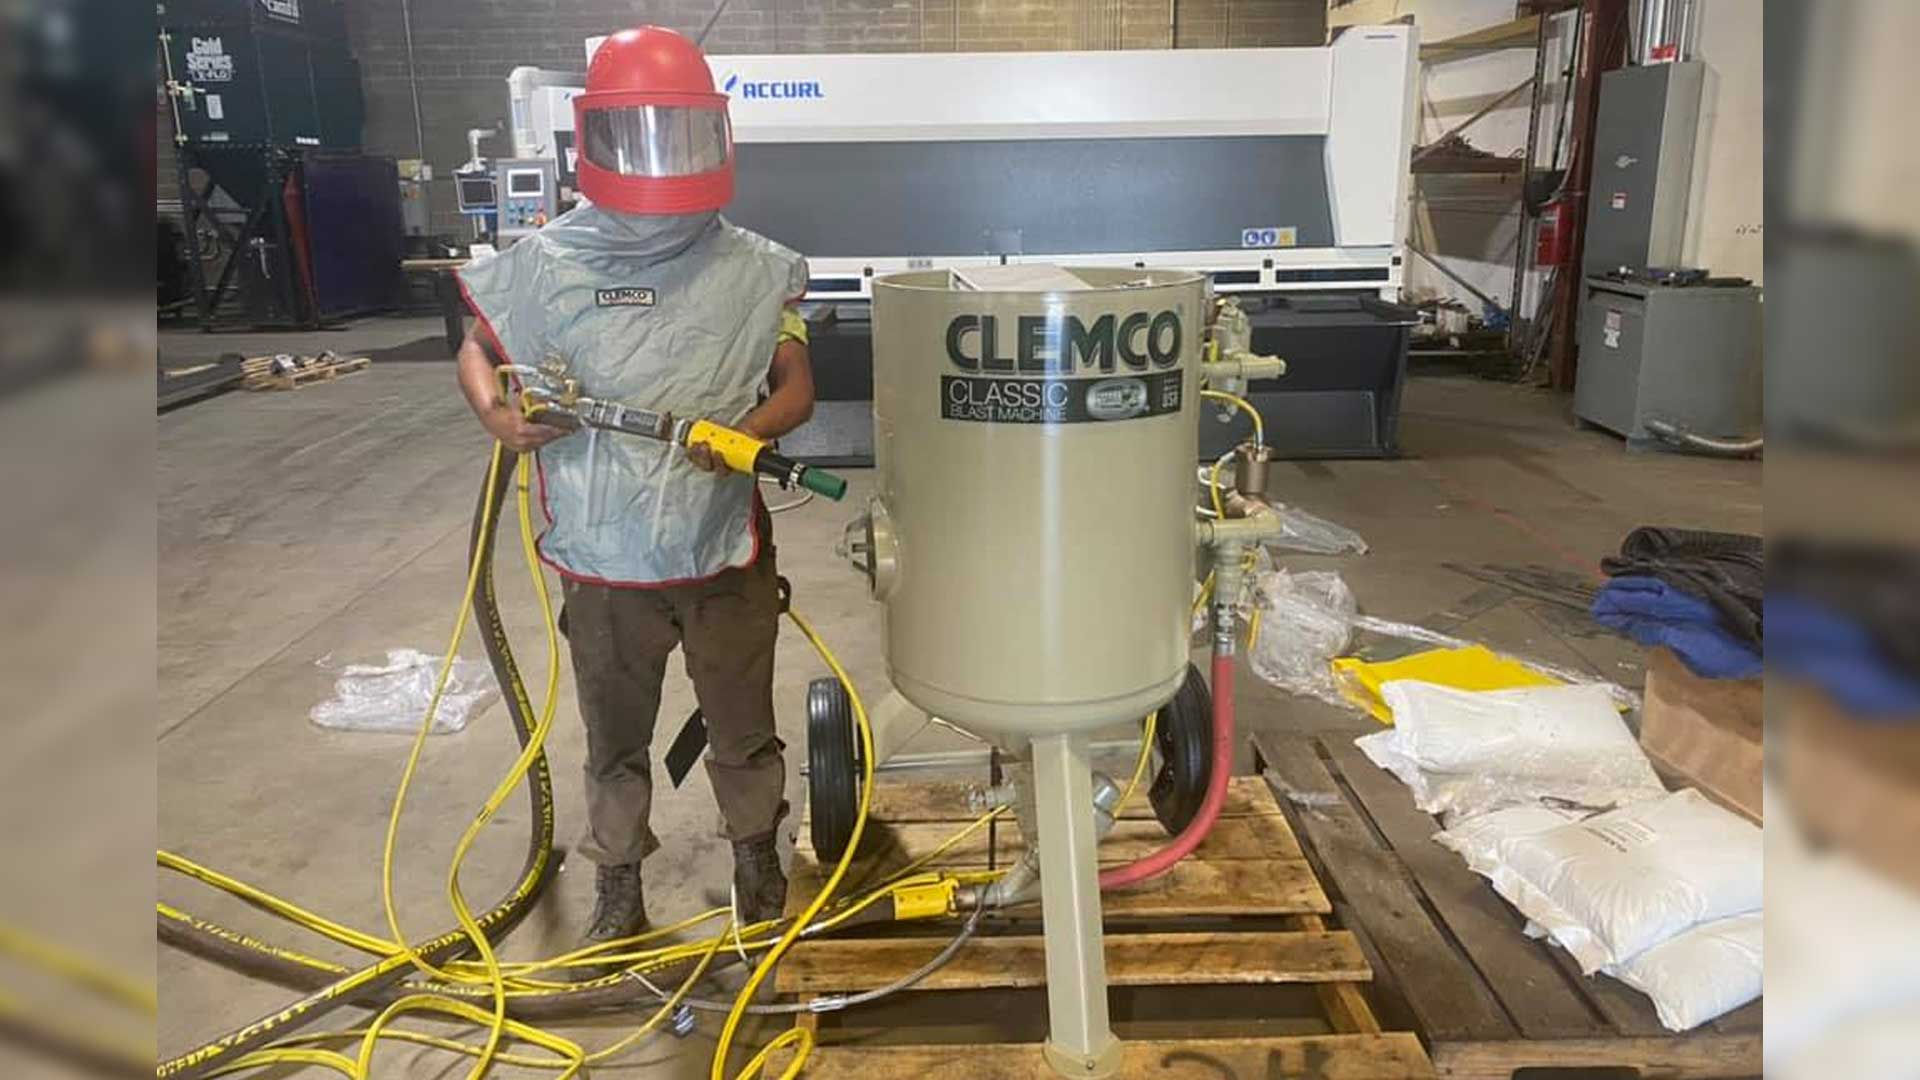 Clemco Classic Blast Sand Blaster